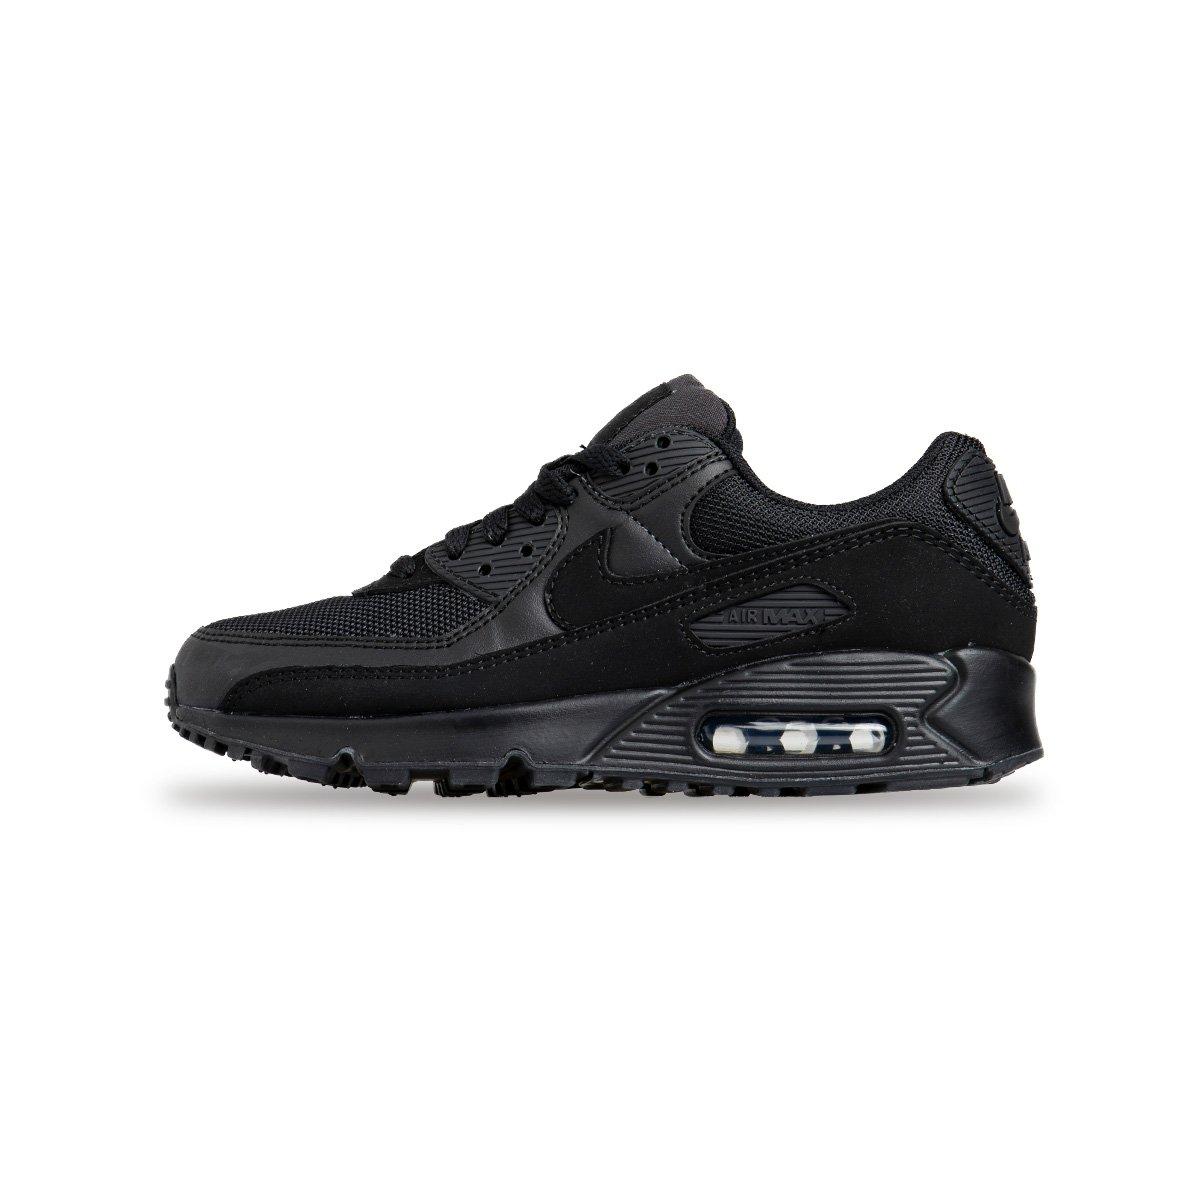 Sneakers Buty damskie Nike Air Max 90 czarne (CQ2560 002)